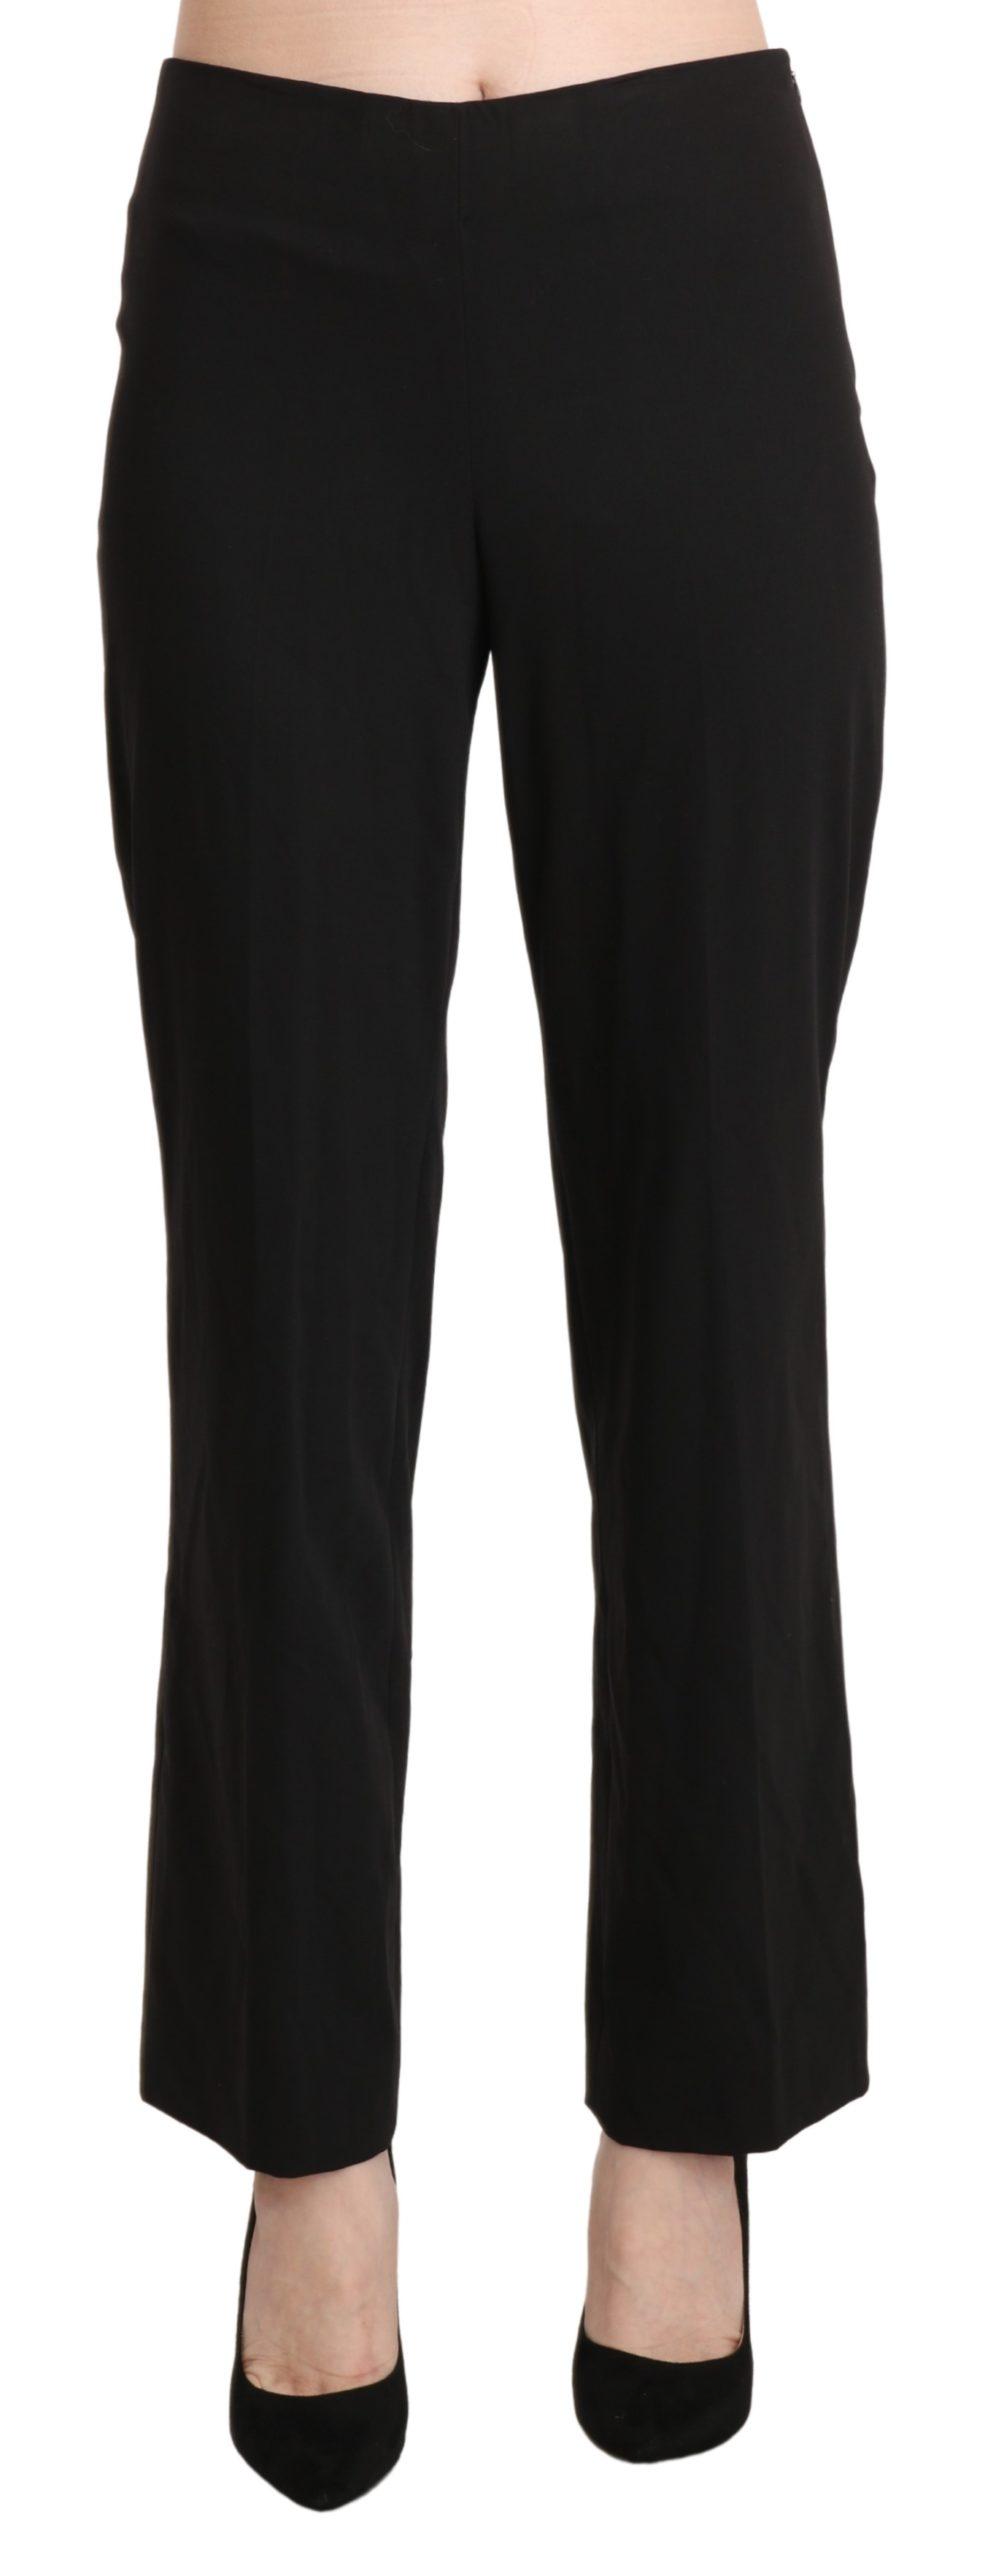 BENCIVENGA Women's Mid Waist Straight Formal Trousers Black PAN71326-42 - IT42 M